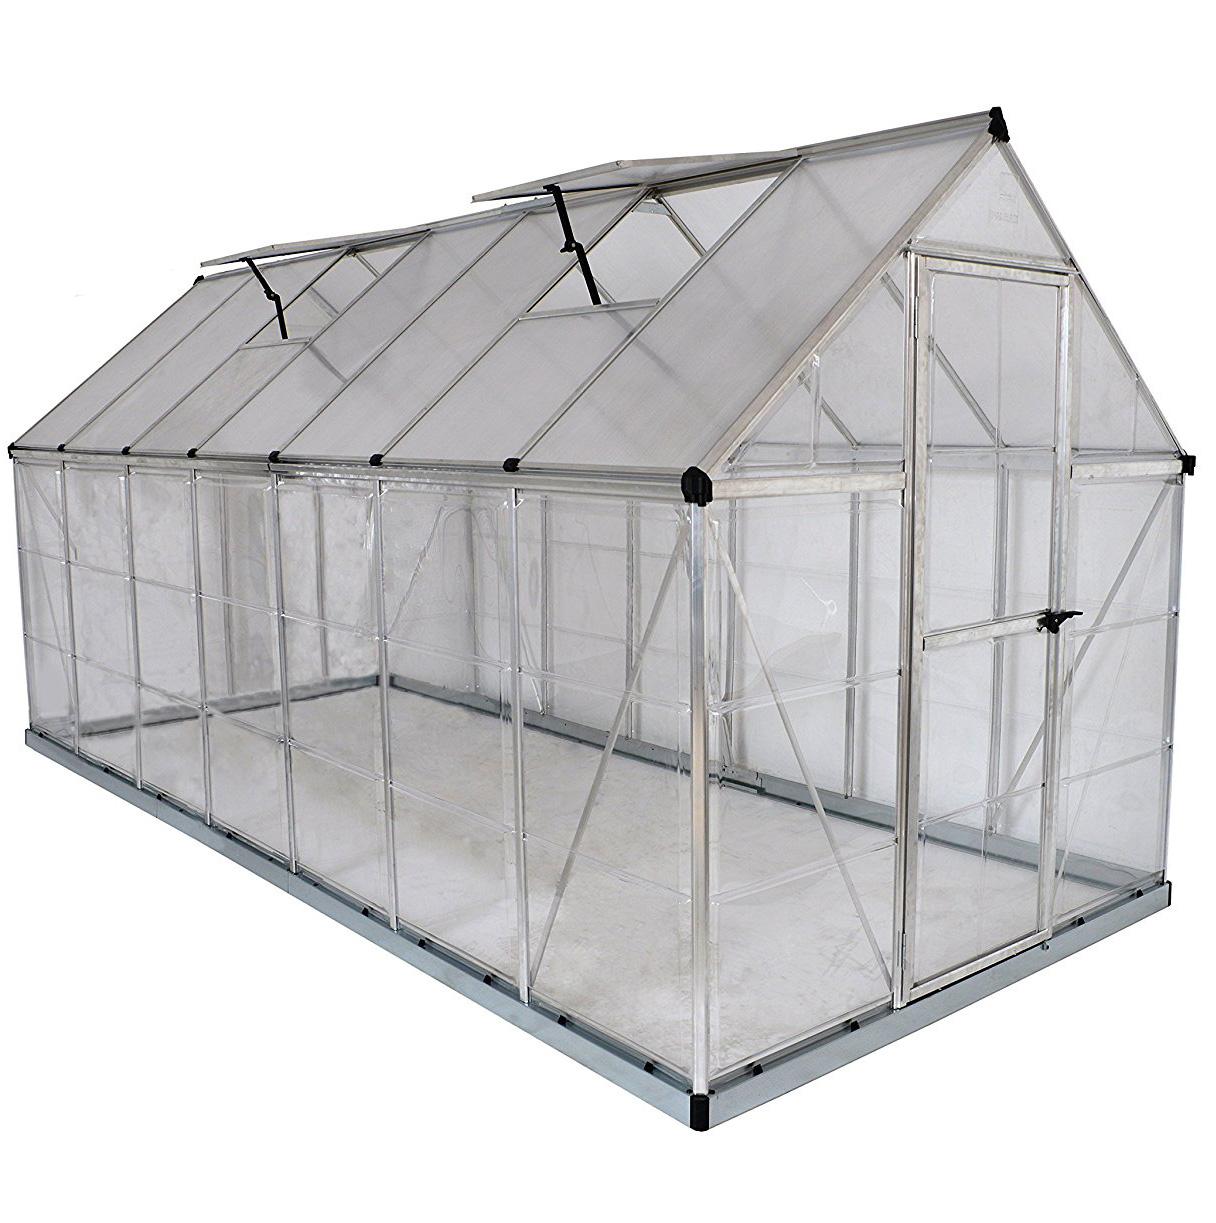 Palram Nature Series Hybrid Hobby Greenhouse - 6' x 14' Silver